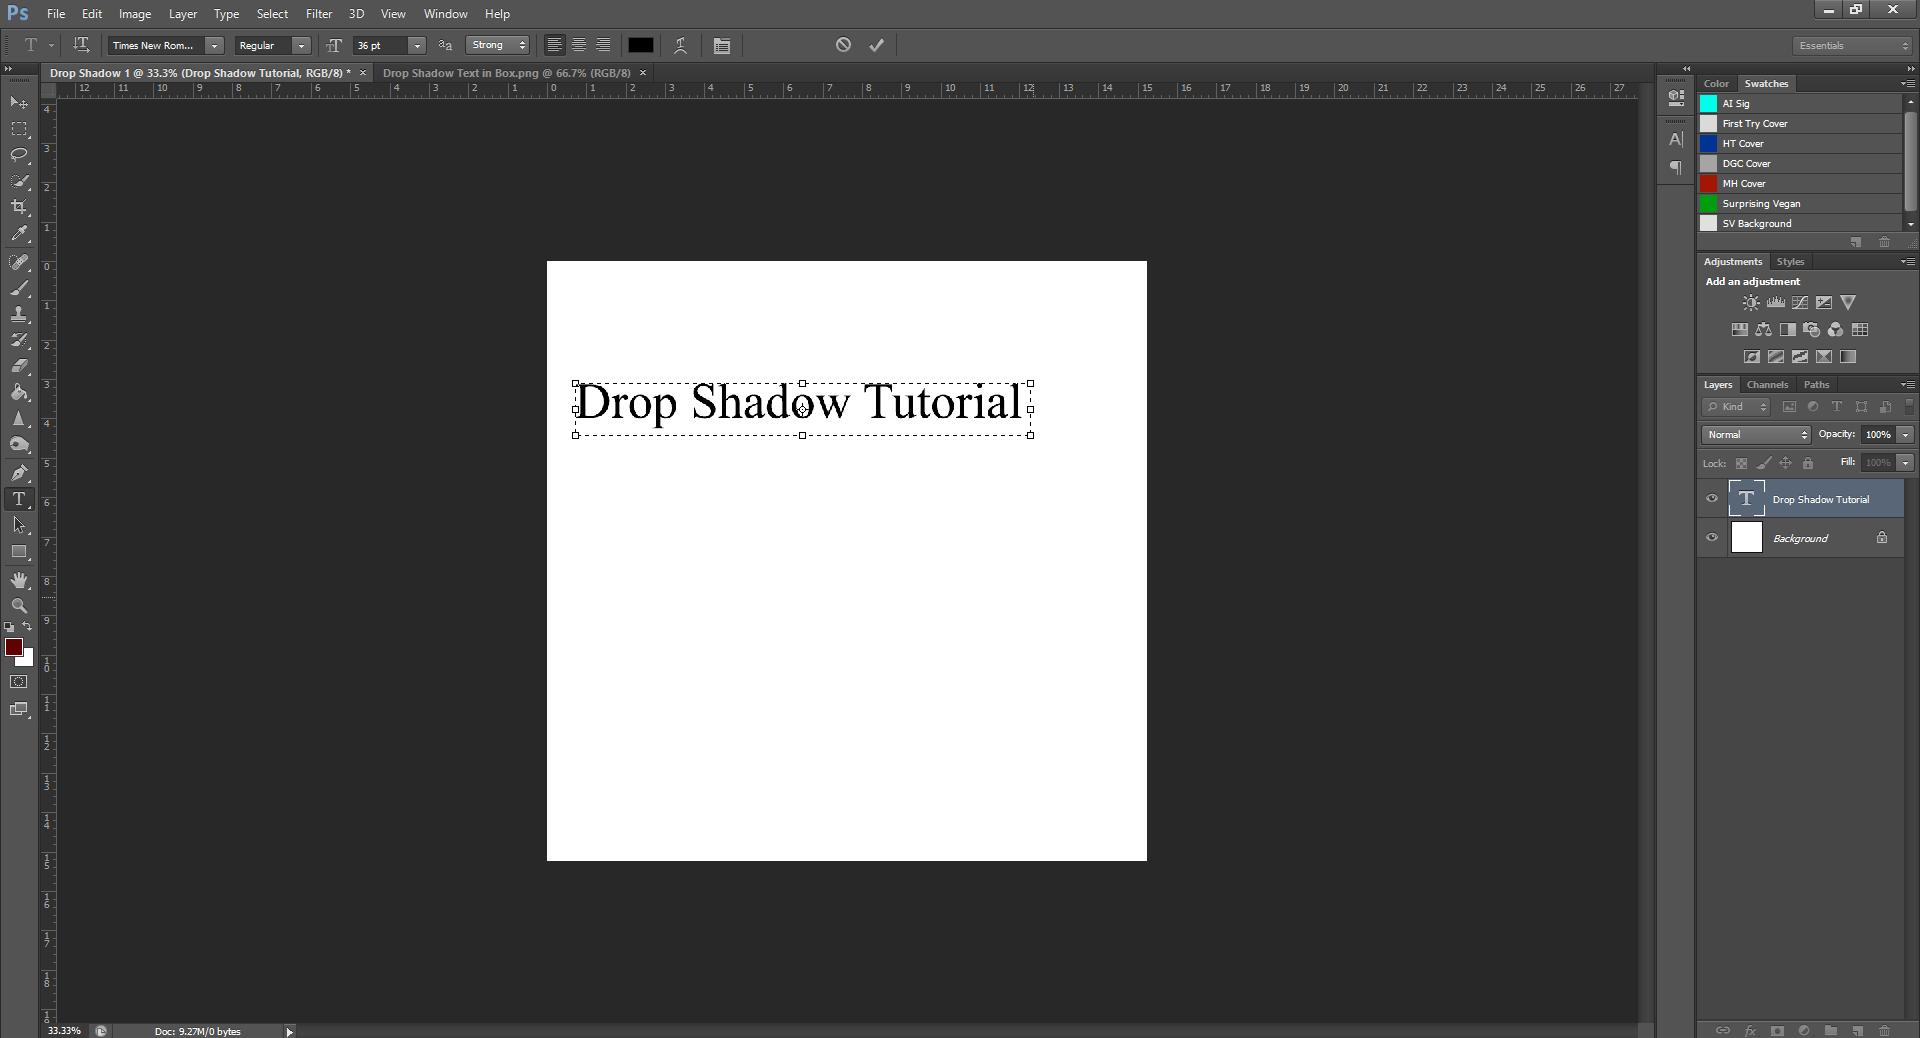 AterImber.com - Writing - Writing Tips - PHSH Tutorial - Drop Shadow - Text Box Resized